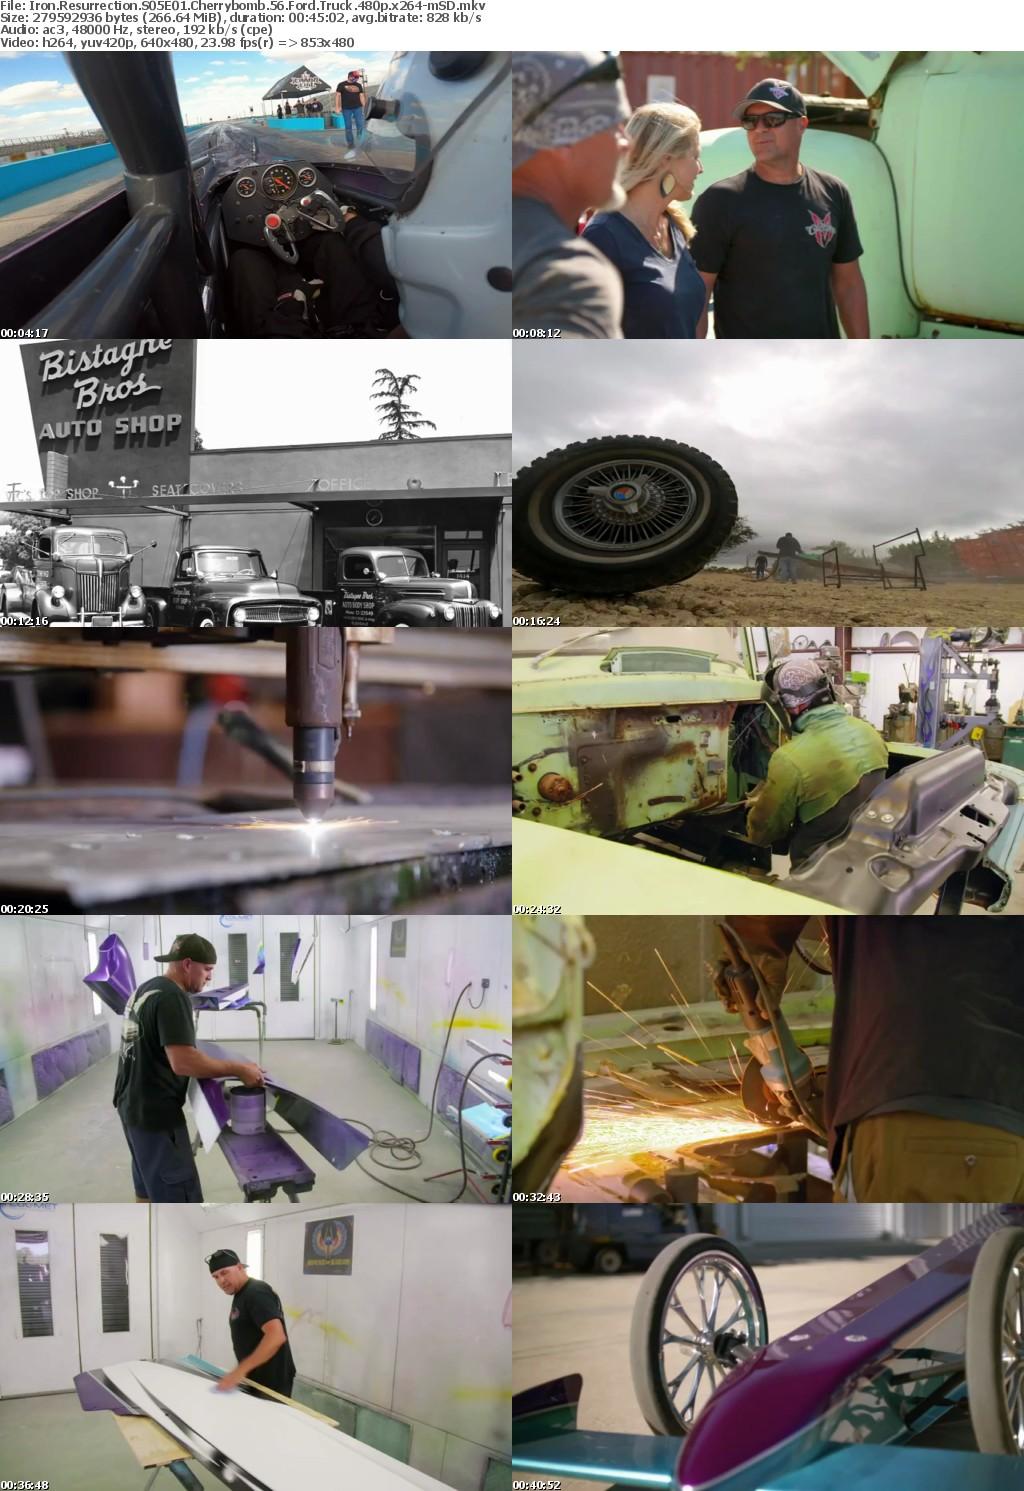 Iron Resurrection S05E01 Cherrybomb 56 Ford Truck 480p x264-mSD